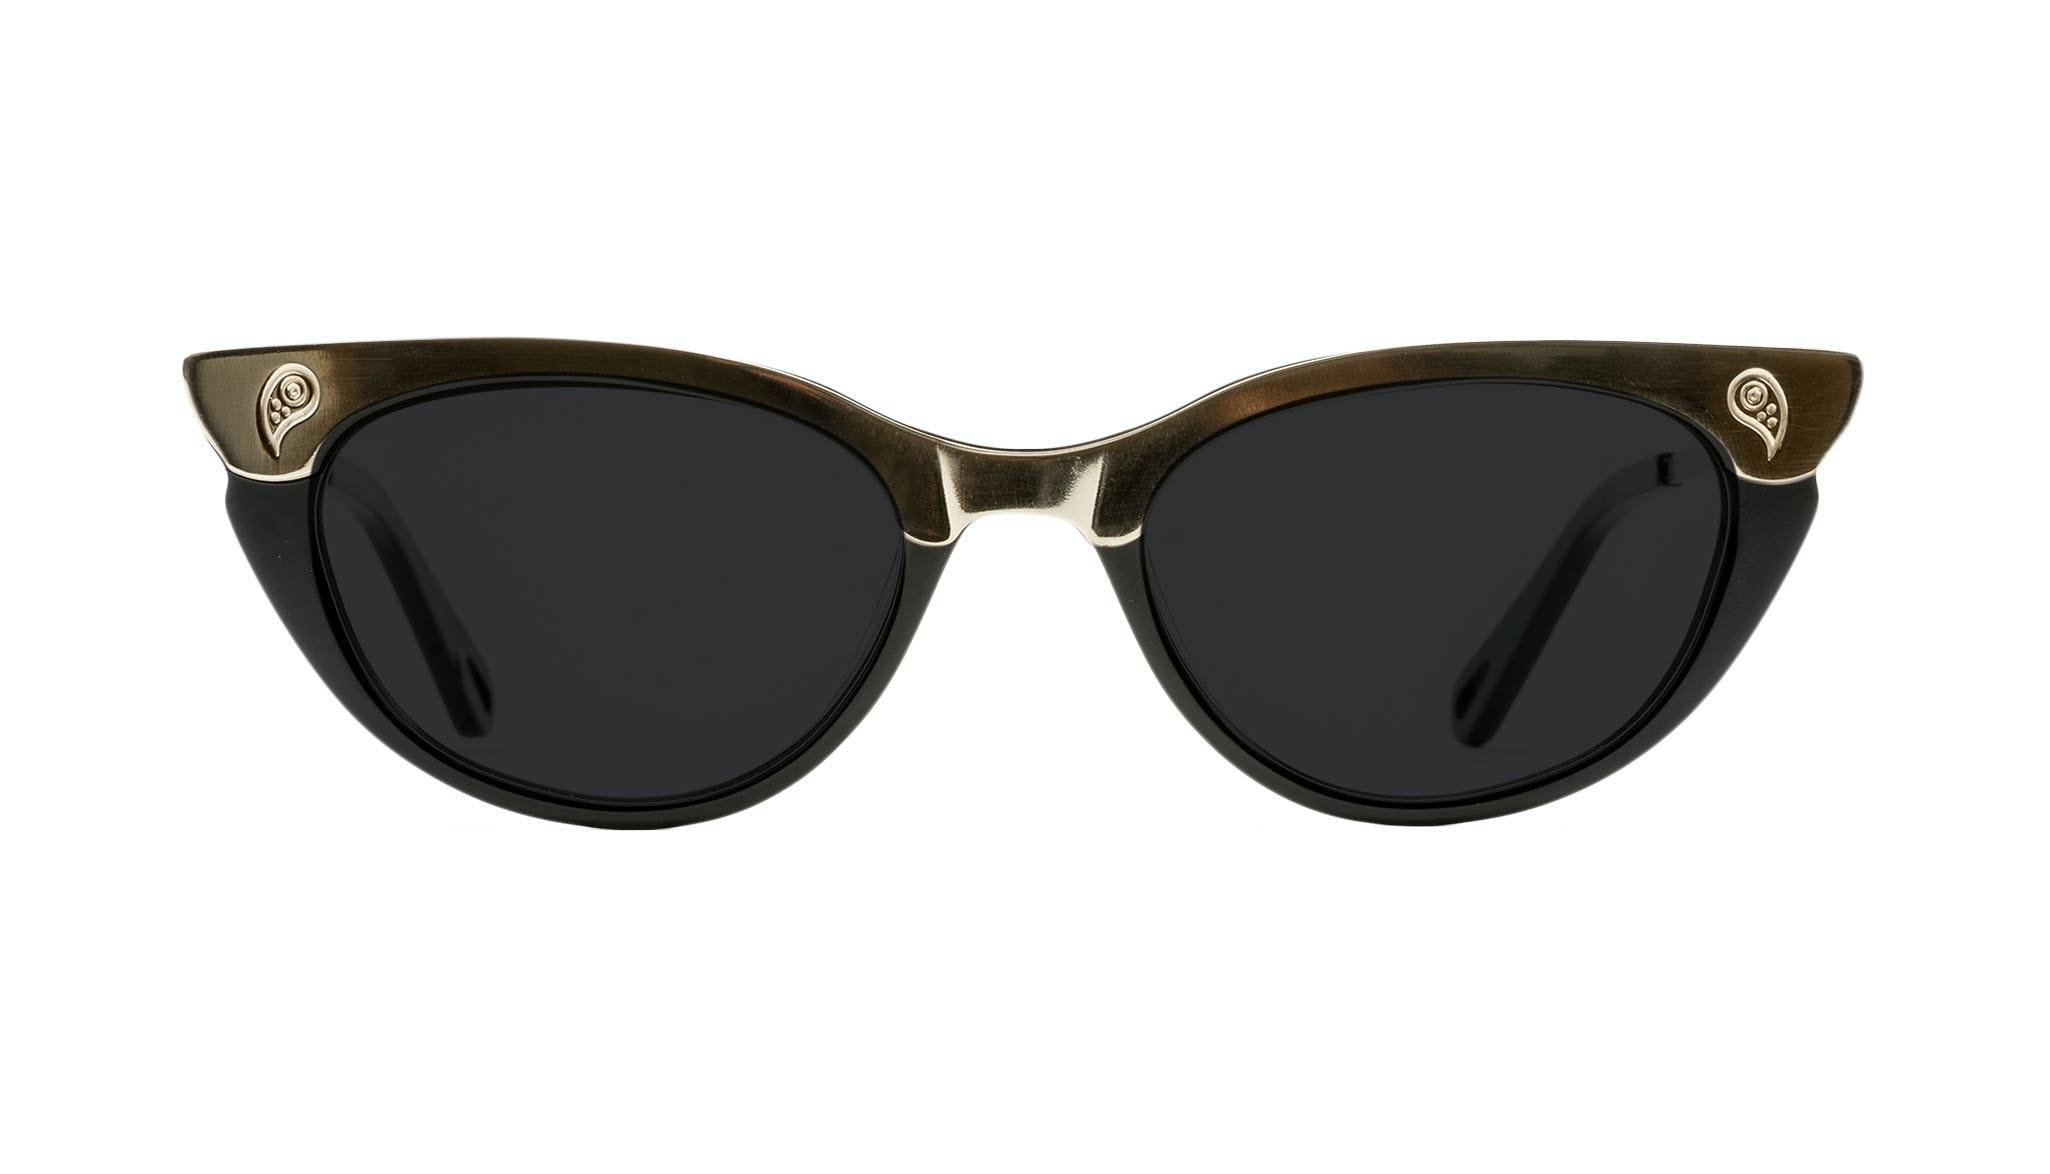 Affordable Fashion Glasses Cat Eye Daring Cateye Sunglasses Women Bad Beti Mumtaz